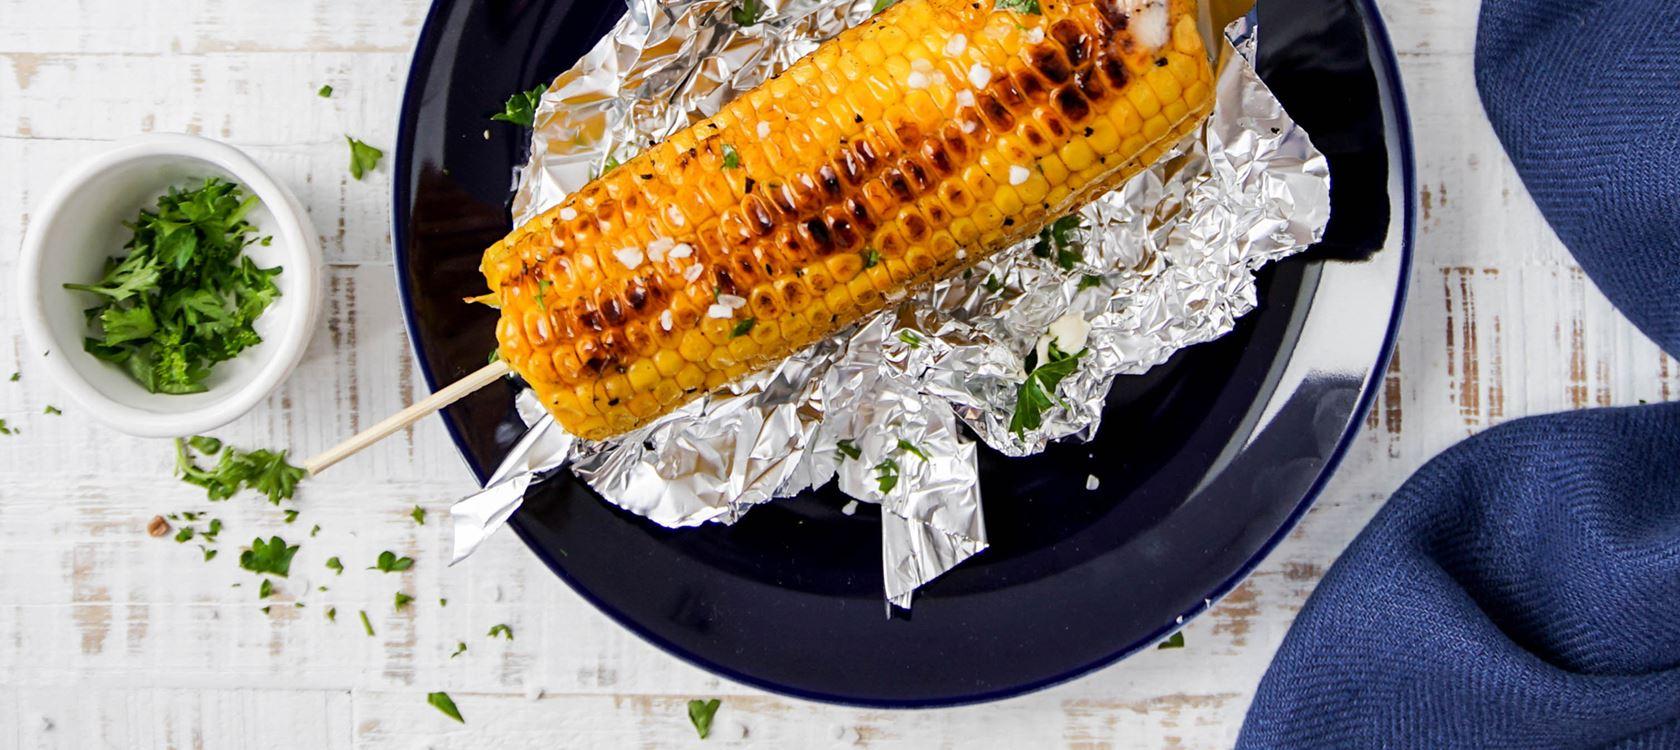 Gegrillter Maiskolben mit knusprigem Kräuterbrot